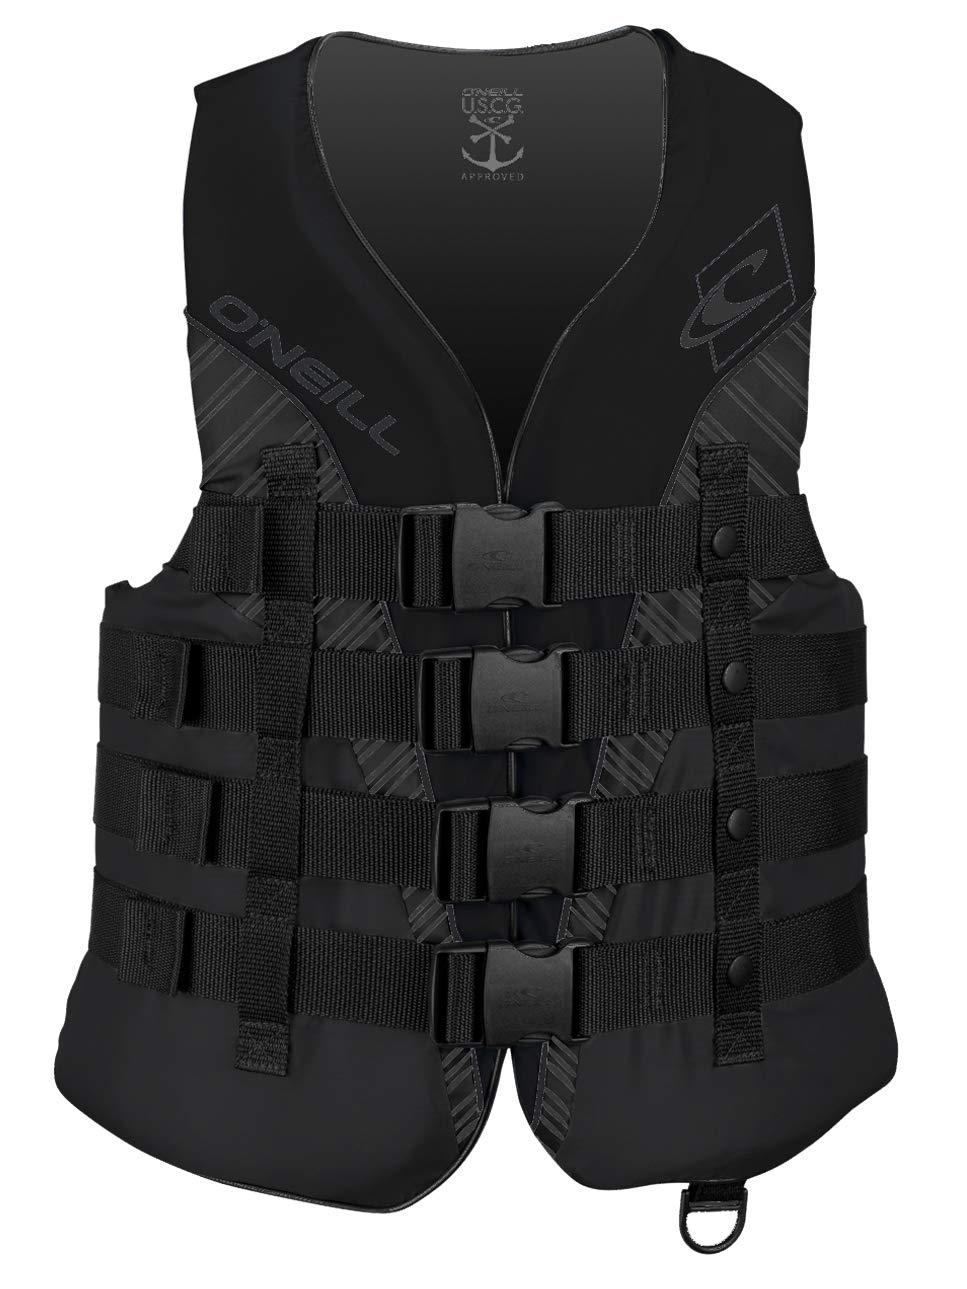 O'Neill Mens Superlite USCG Life Vest 3XL Black Stealth (4723)